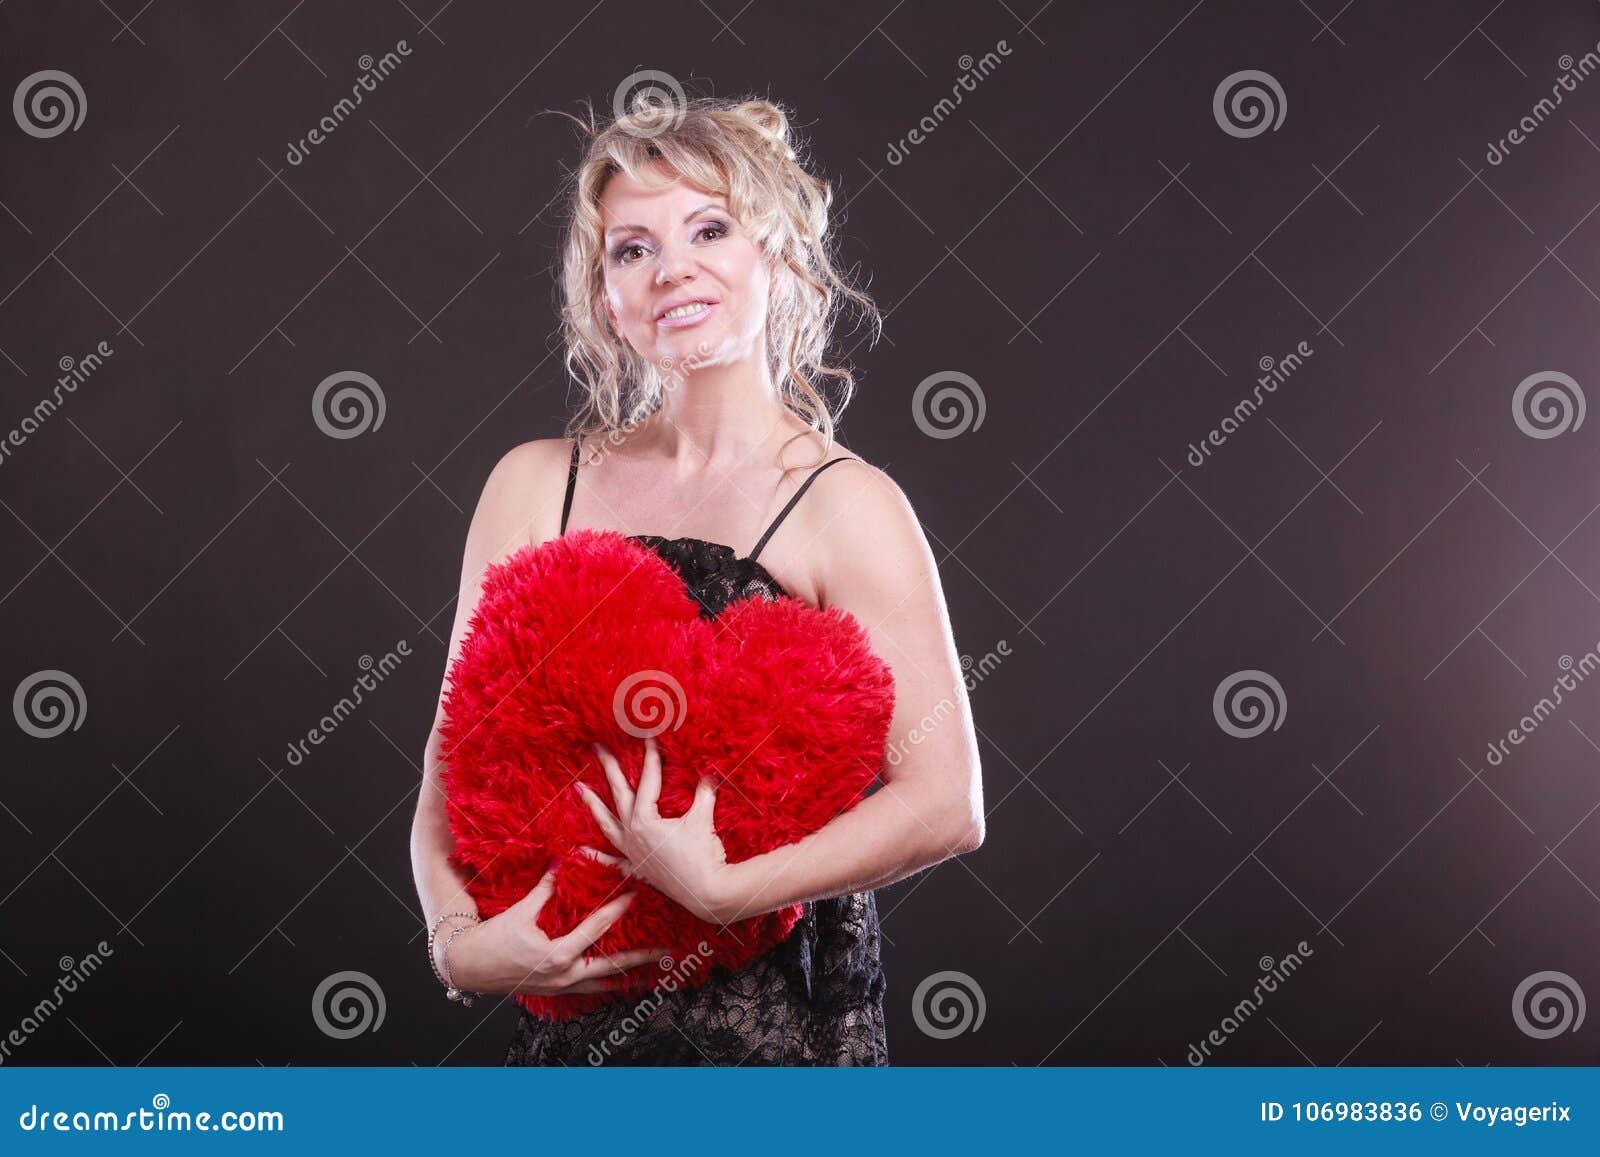 mature woman hug big red heart stock photo - image of gift